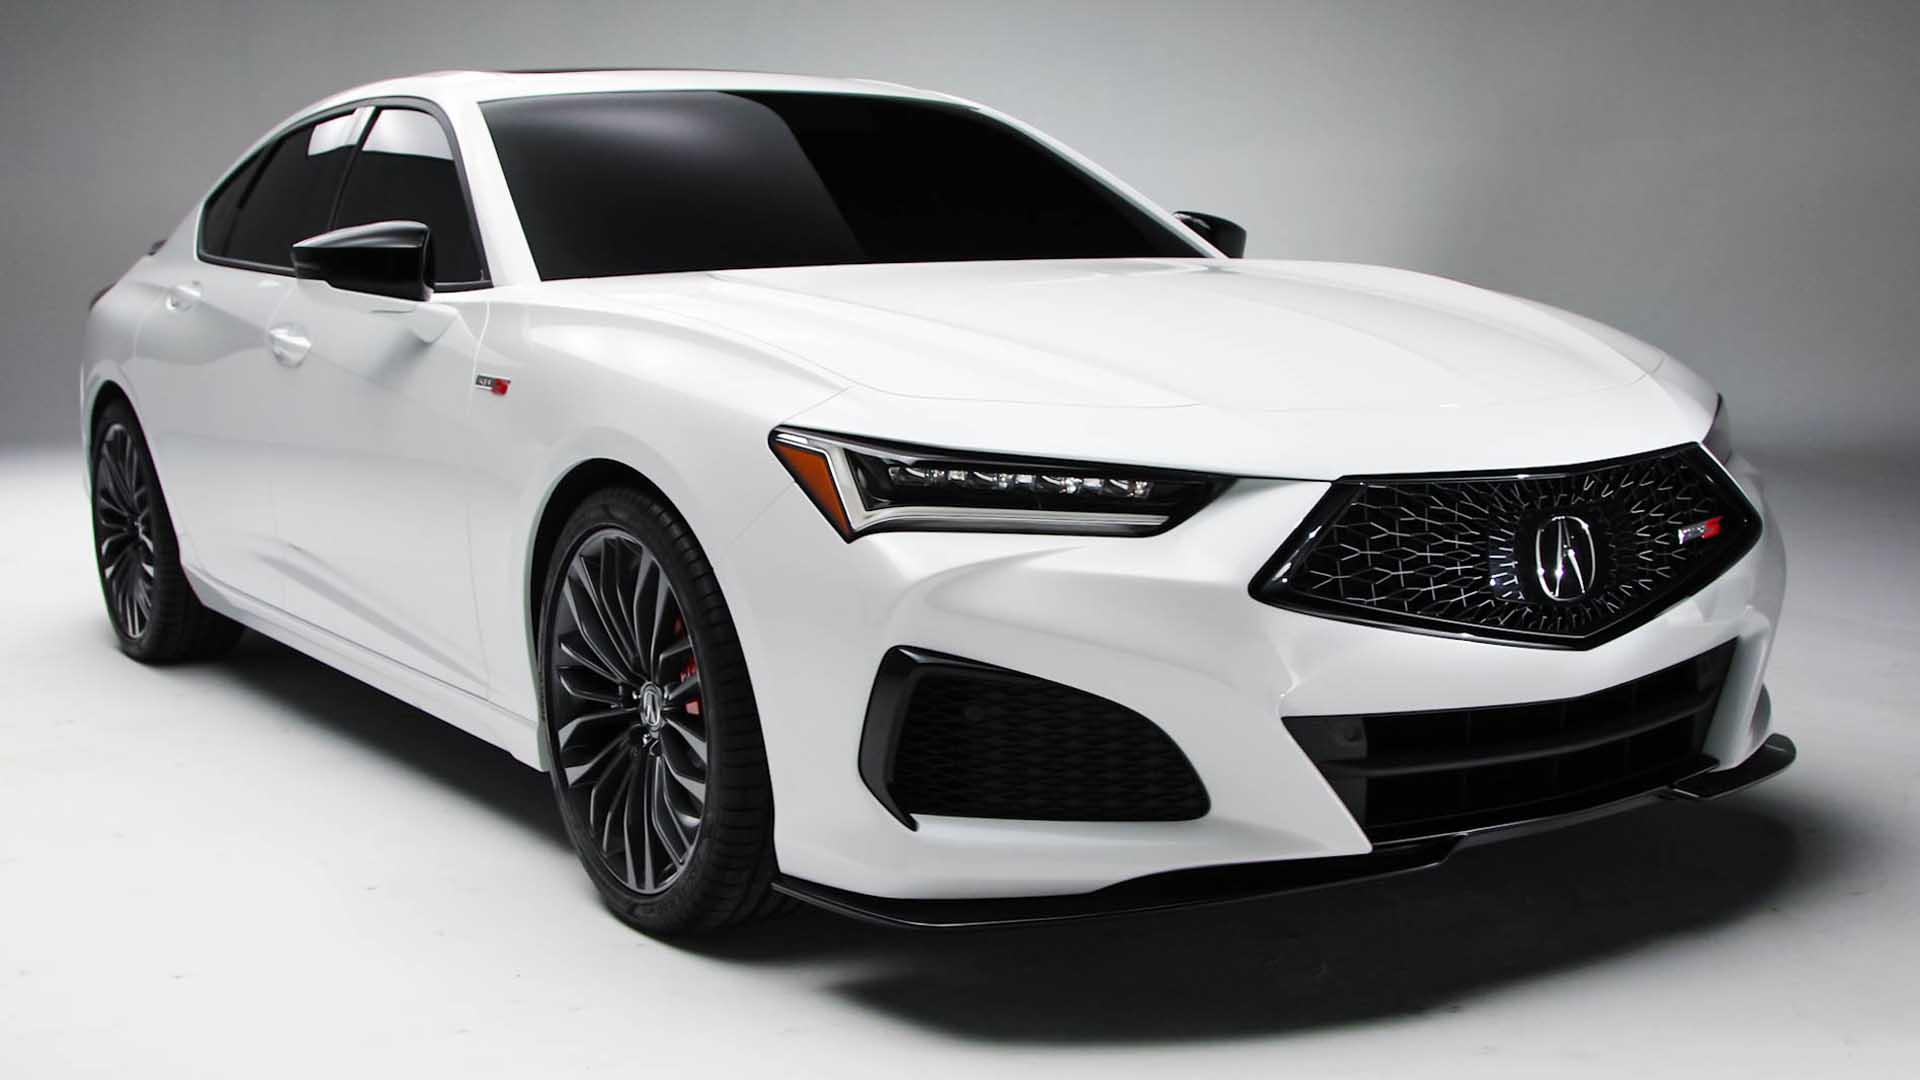 2021 Acura TLX 2020 Toyota 86 ATS RR Turbo Car News Headlines 1920x1080